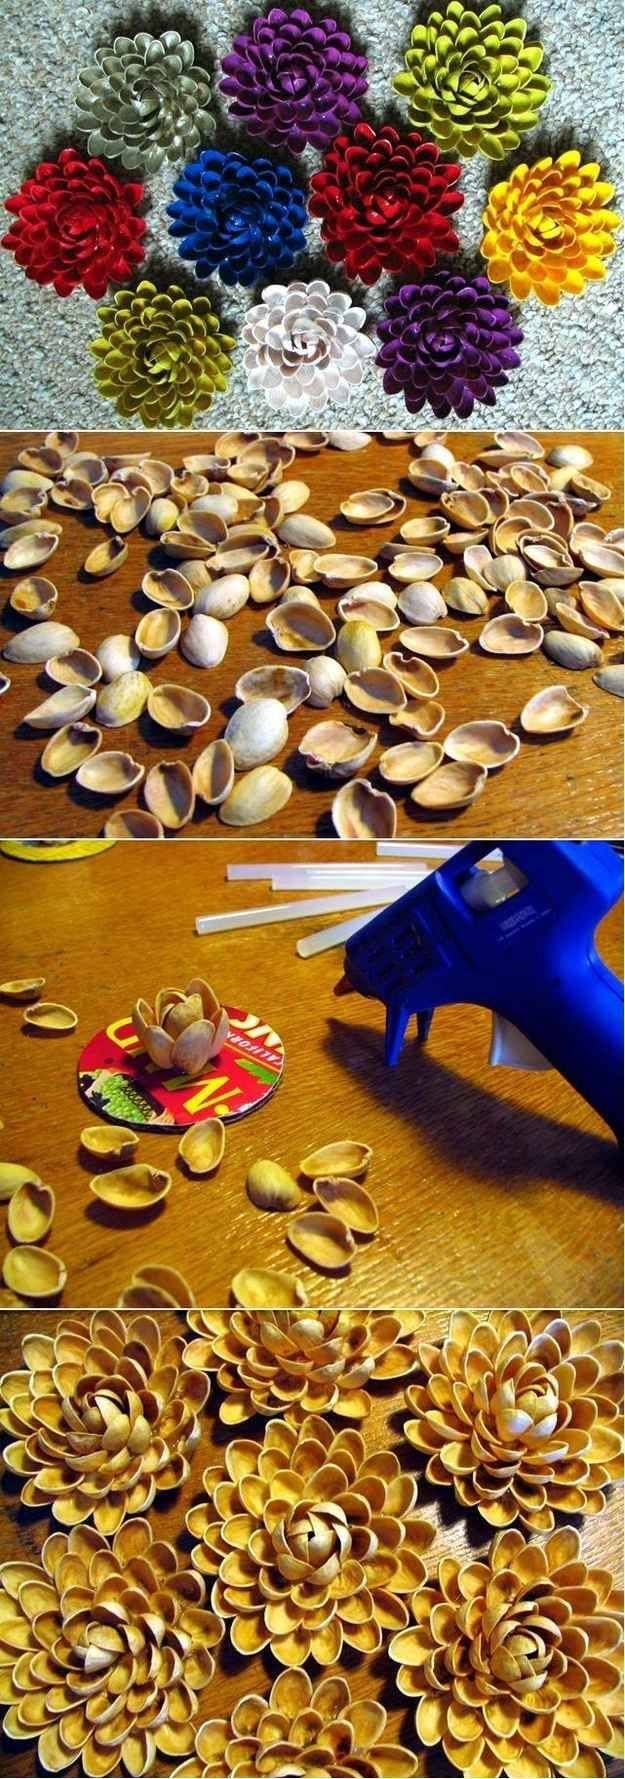 Art with Pistachio shells